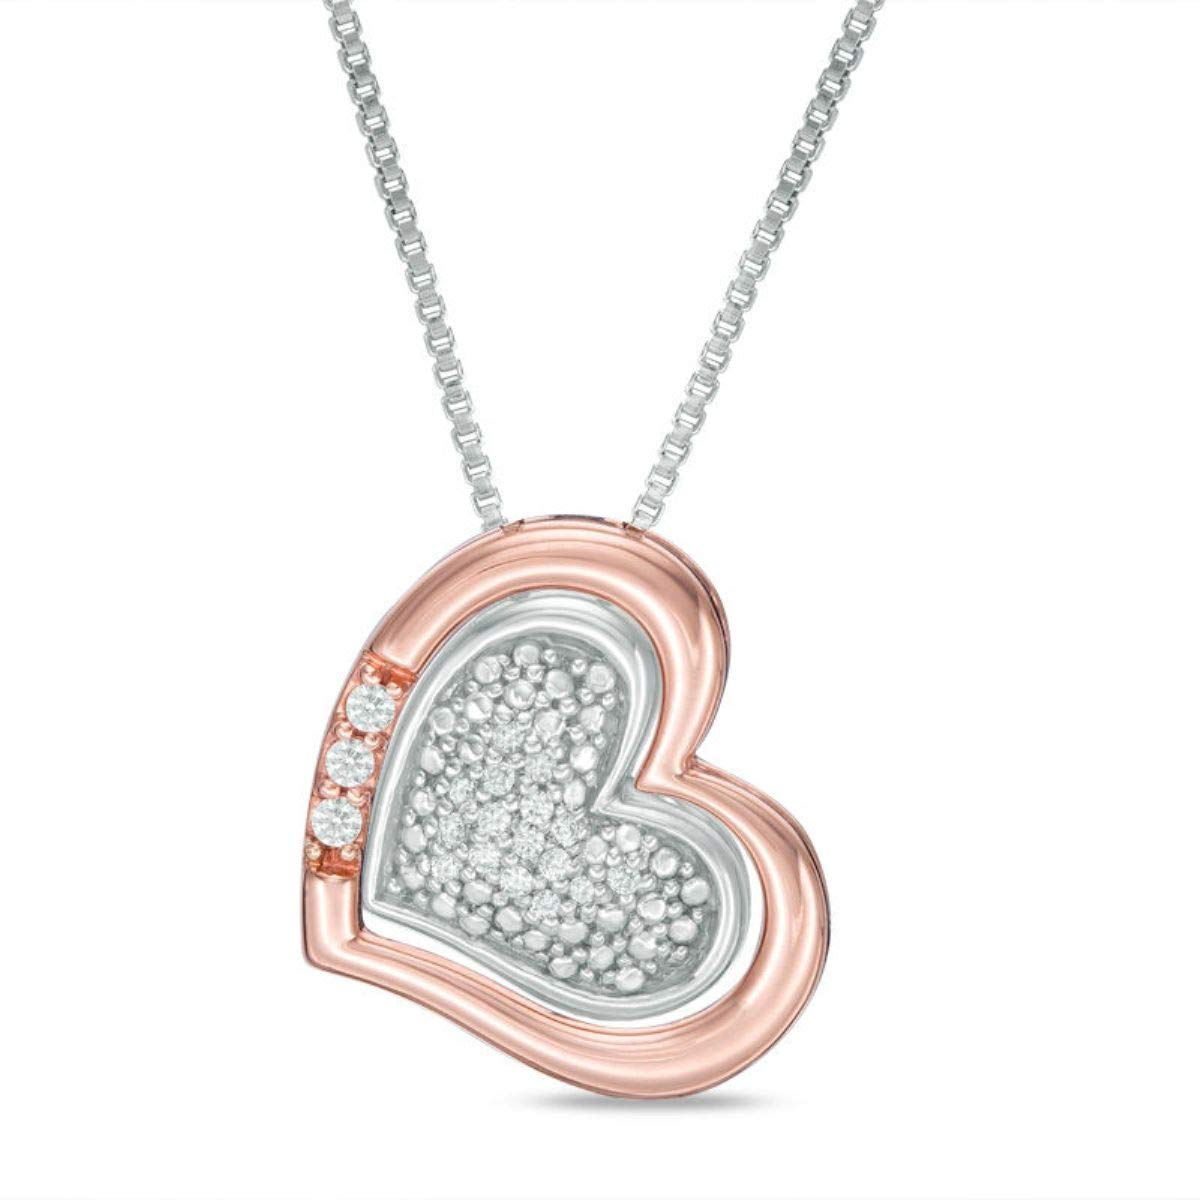 TrioStar Round Diamond 14K White Gold Plated Love Heart Pendant Valentine Gift for Her